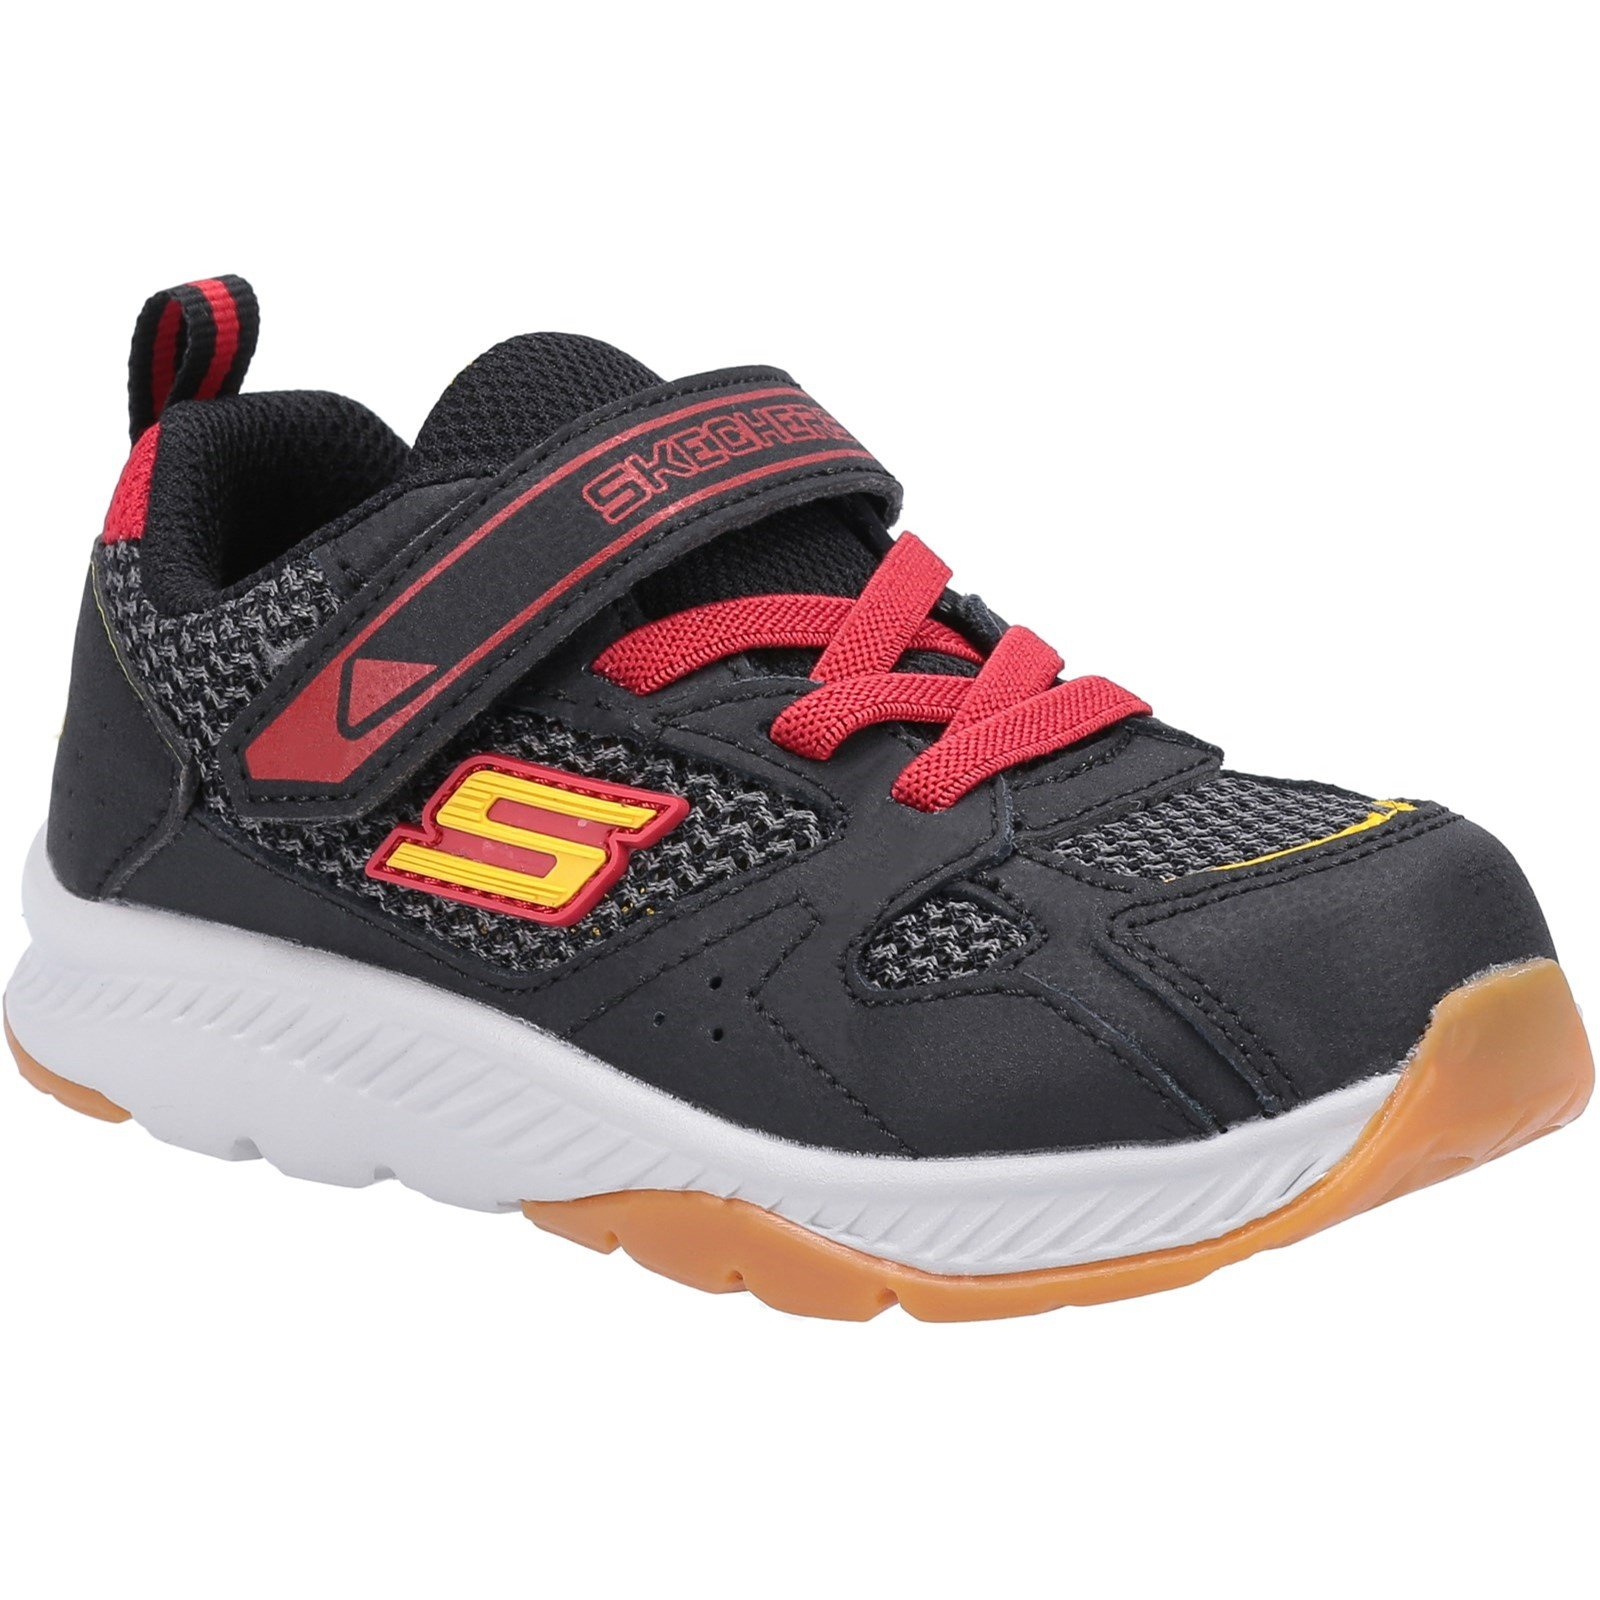 Skechers Kid's Comfy Grip Trainer Multicolor 30424 - Black/Red 6